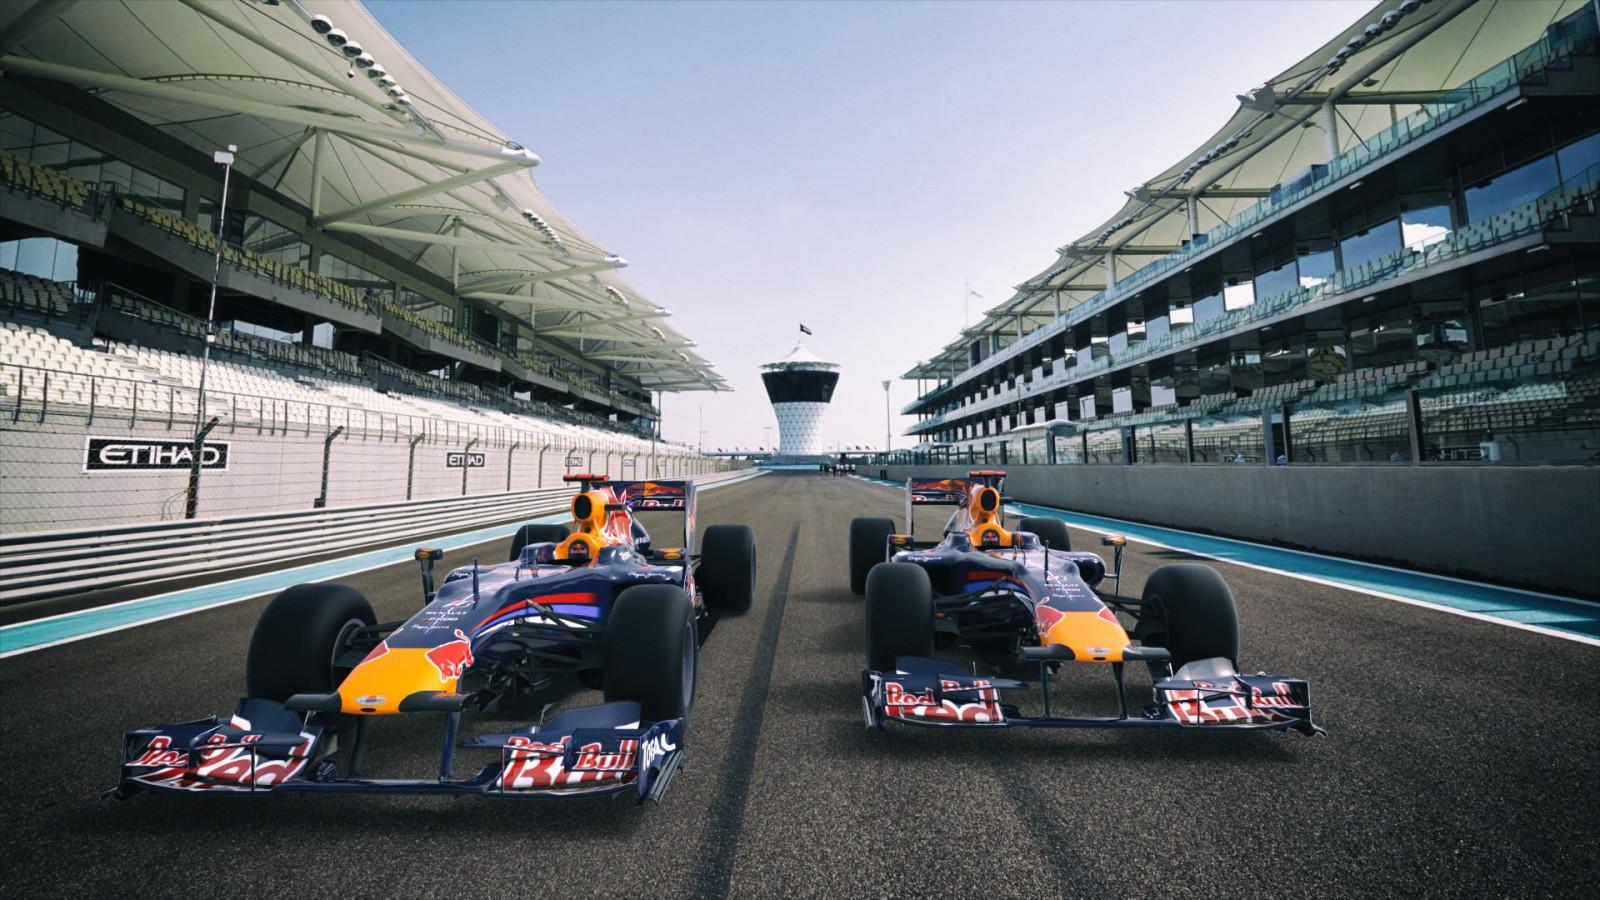 Wallpaper 3D Kendaraan Jalan Formula 1 Red Bull Mobil